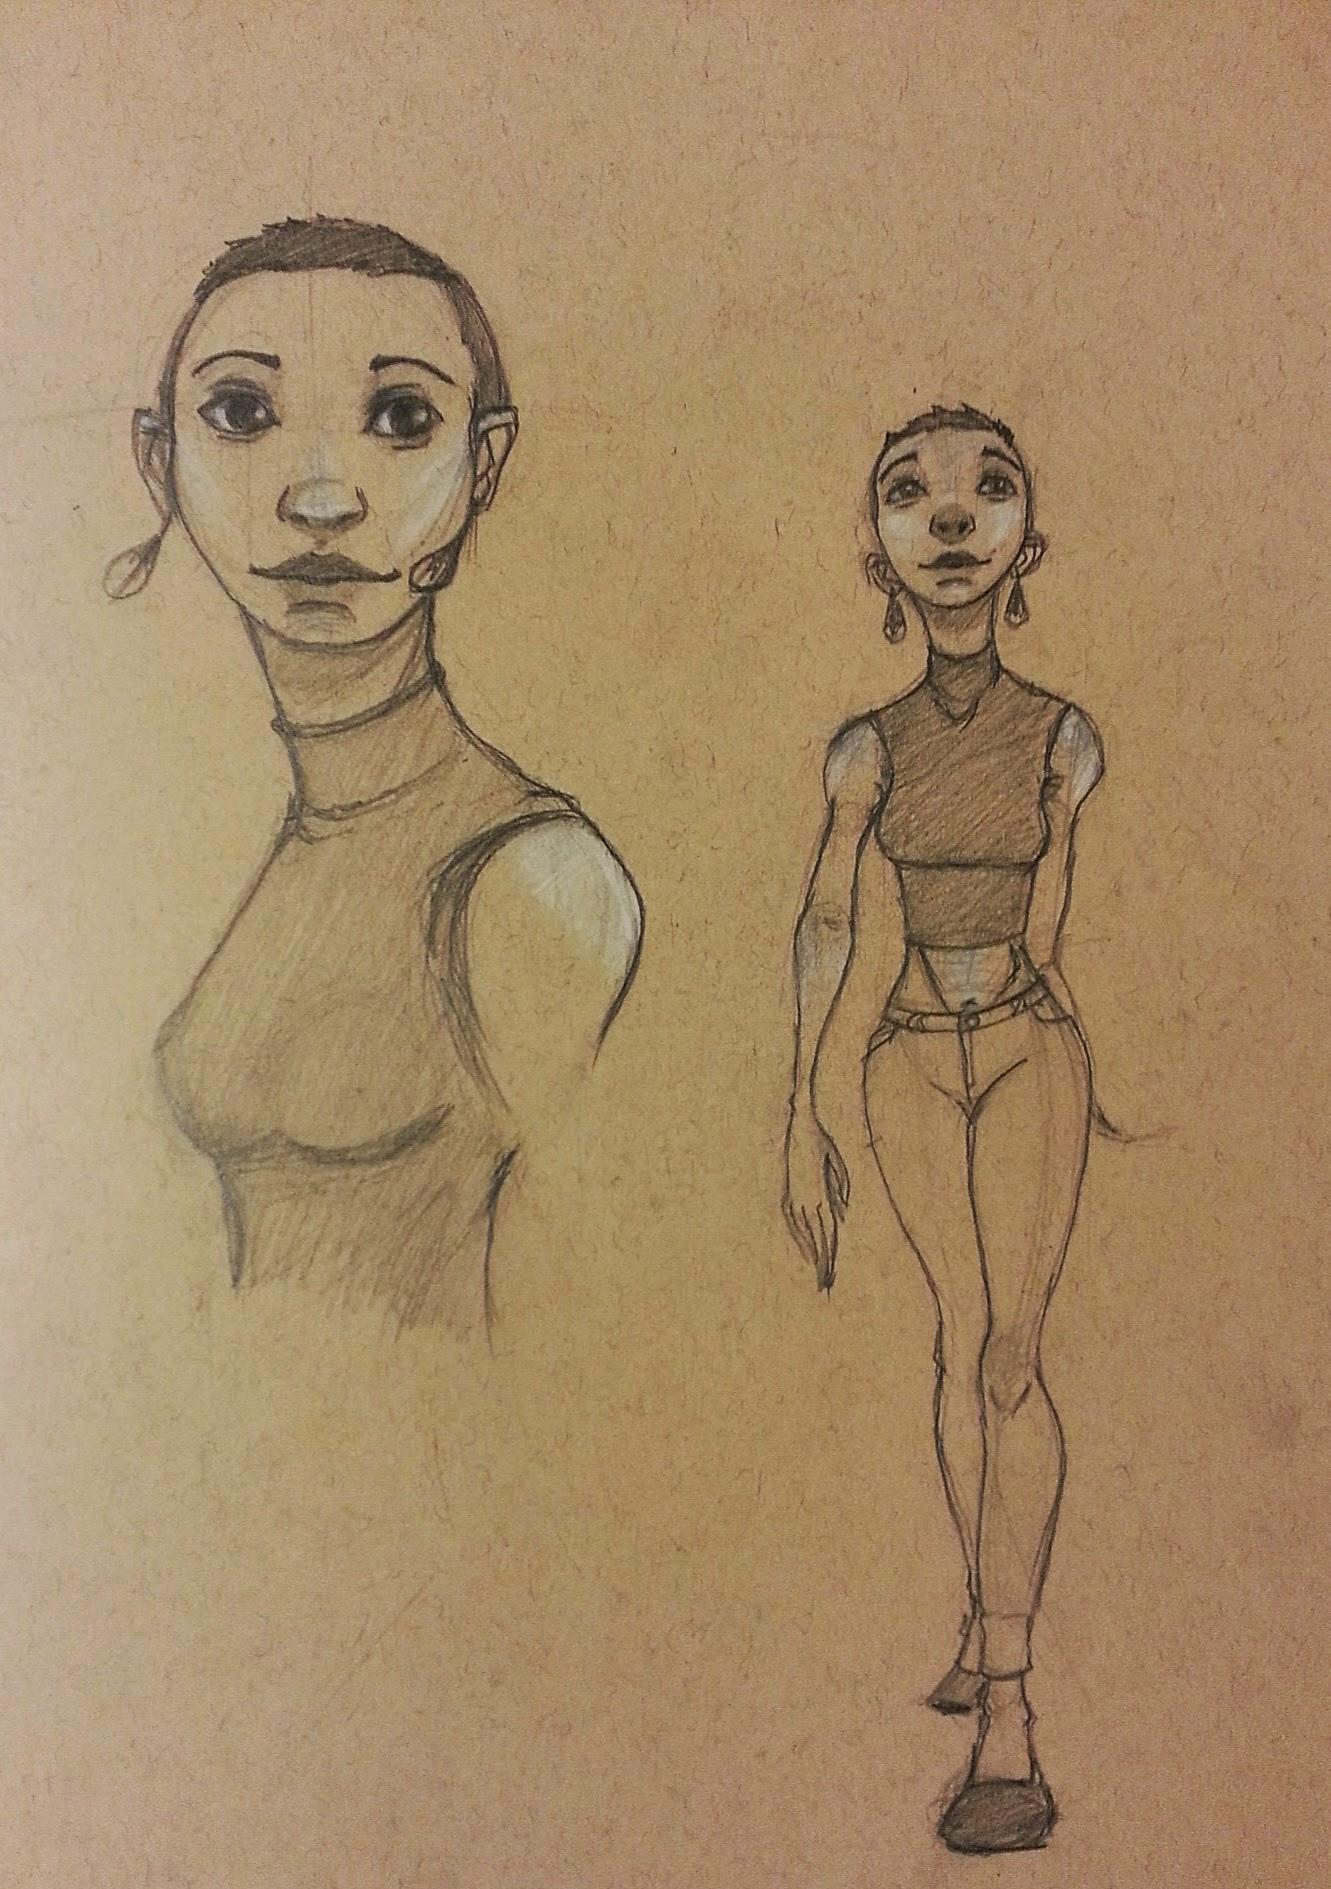 Self Character Design.jpg